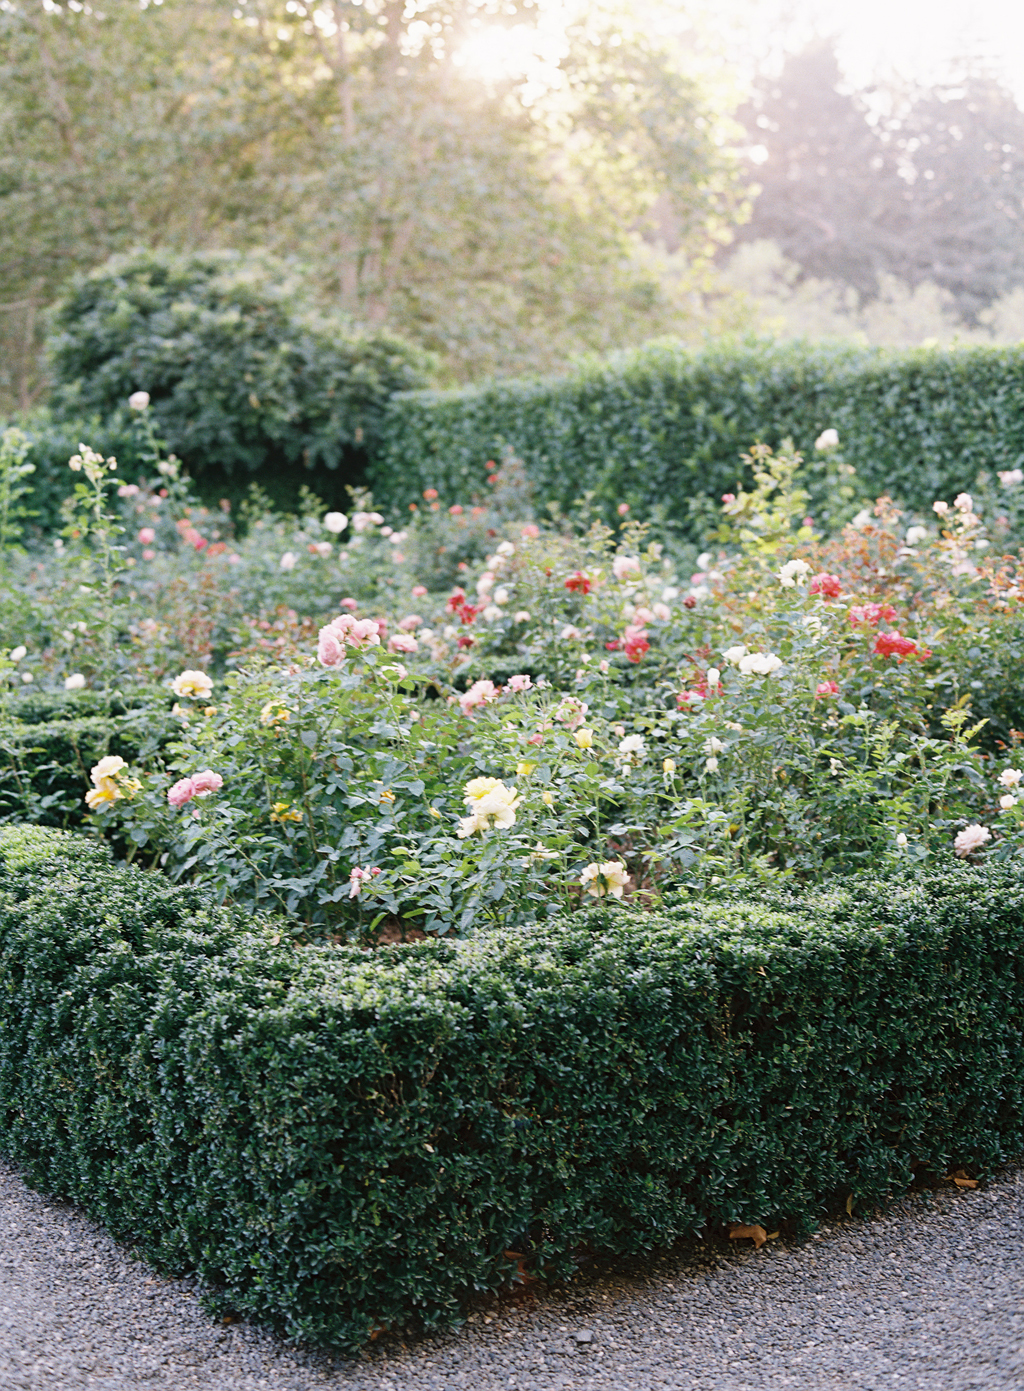 the beautiful rose garden at beaulieu gardens glows in the sunset light